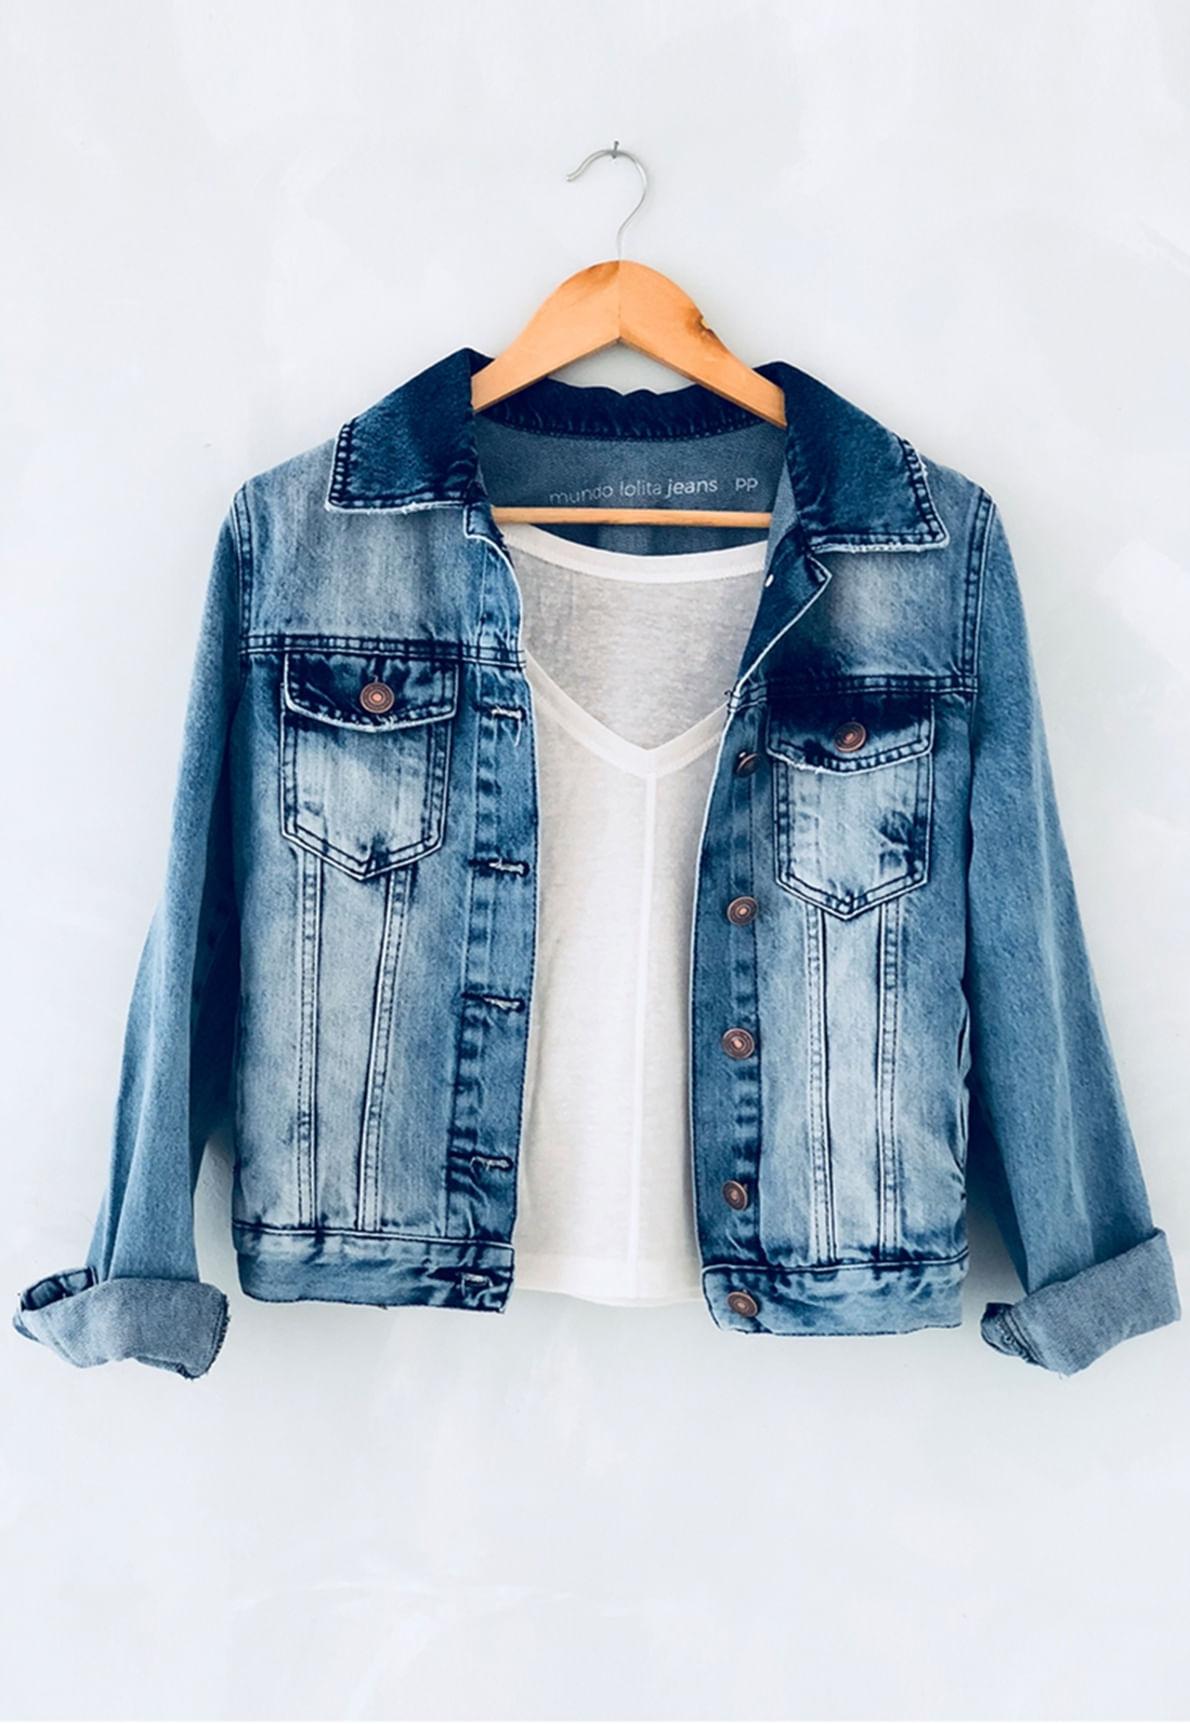 21345-jaqueta-jeans-stormi-mundo-lolita-01